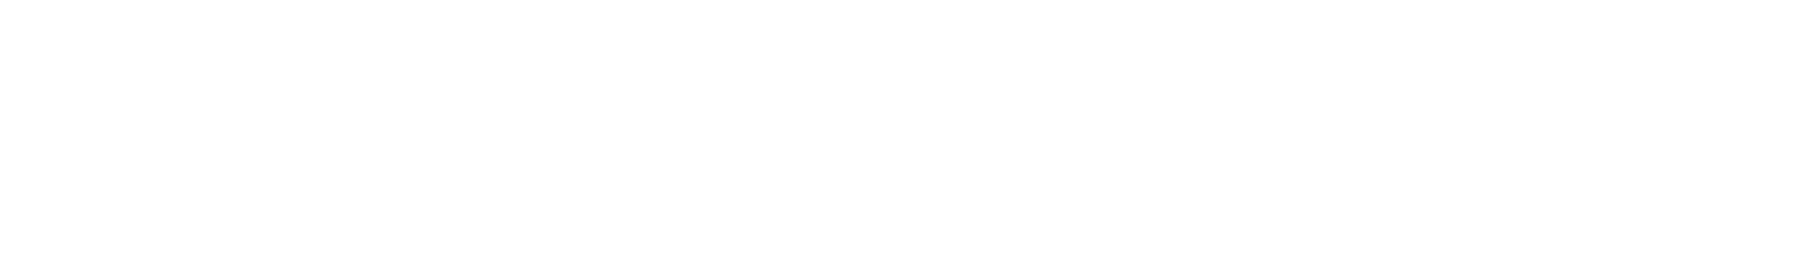 jazz cut f